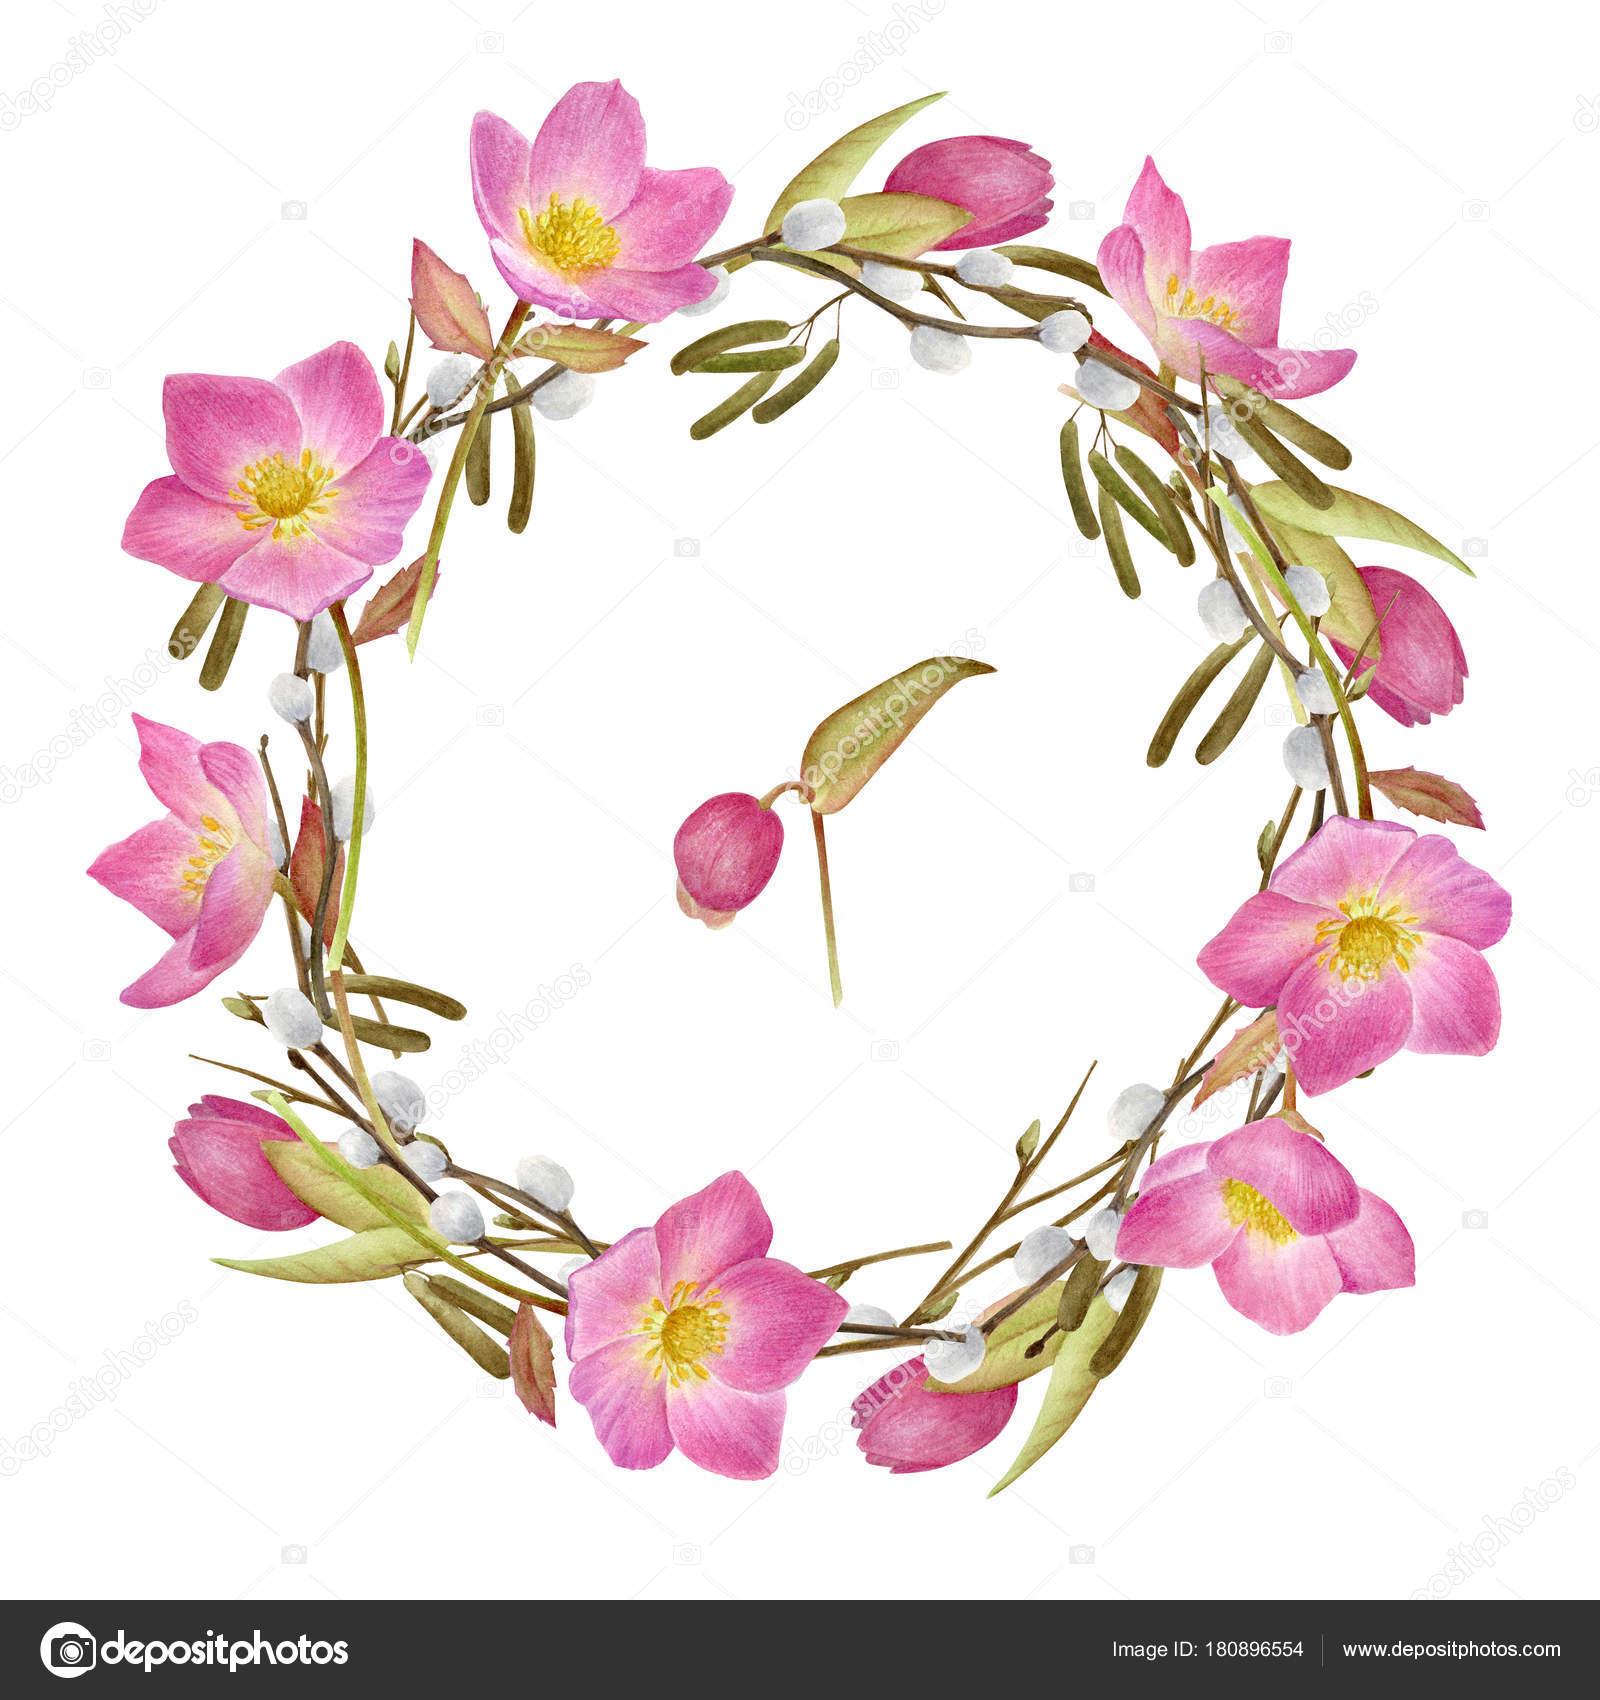 Handbemalt Aquarelle Blumen Set Im Vintage Stil Perfekt Fur